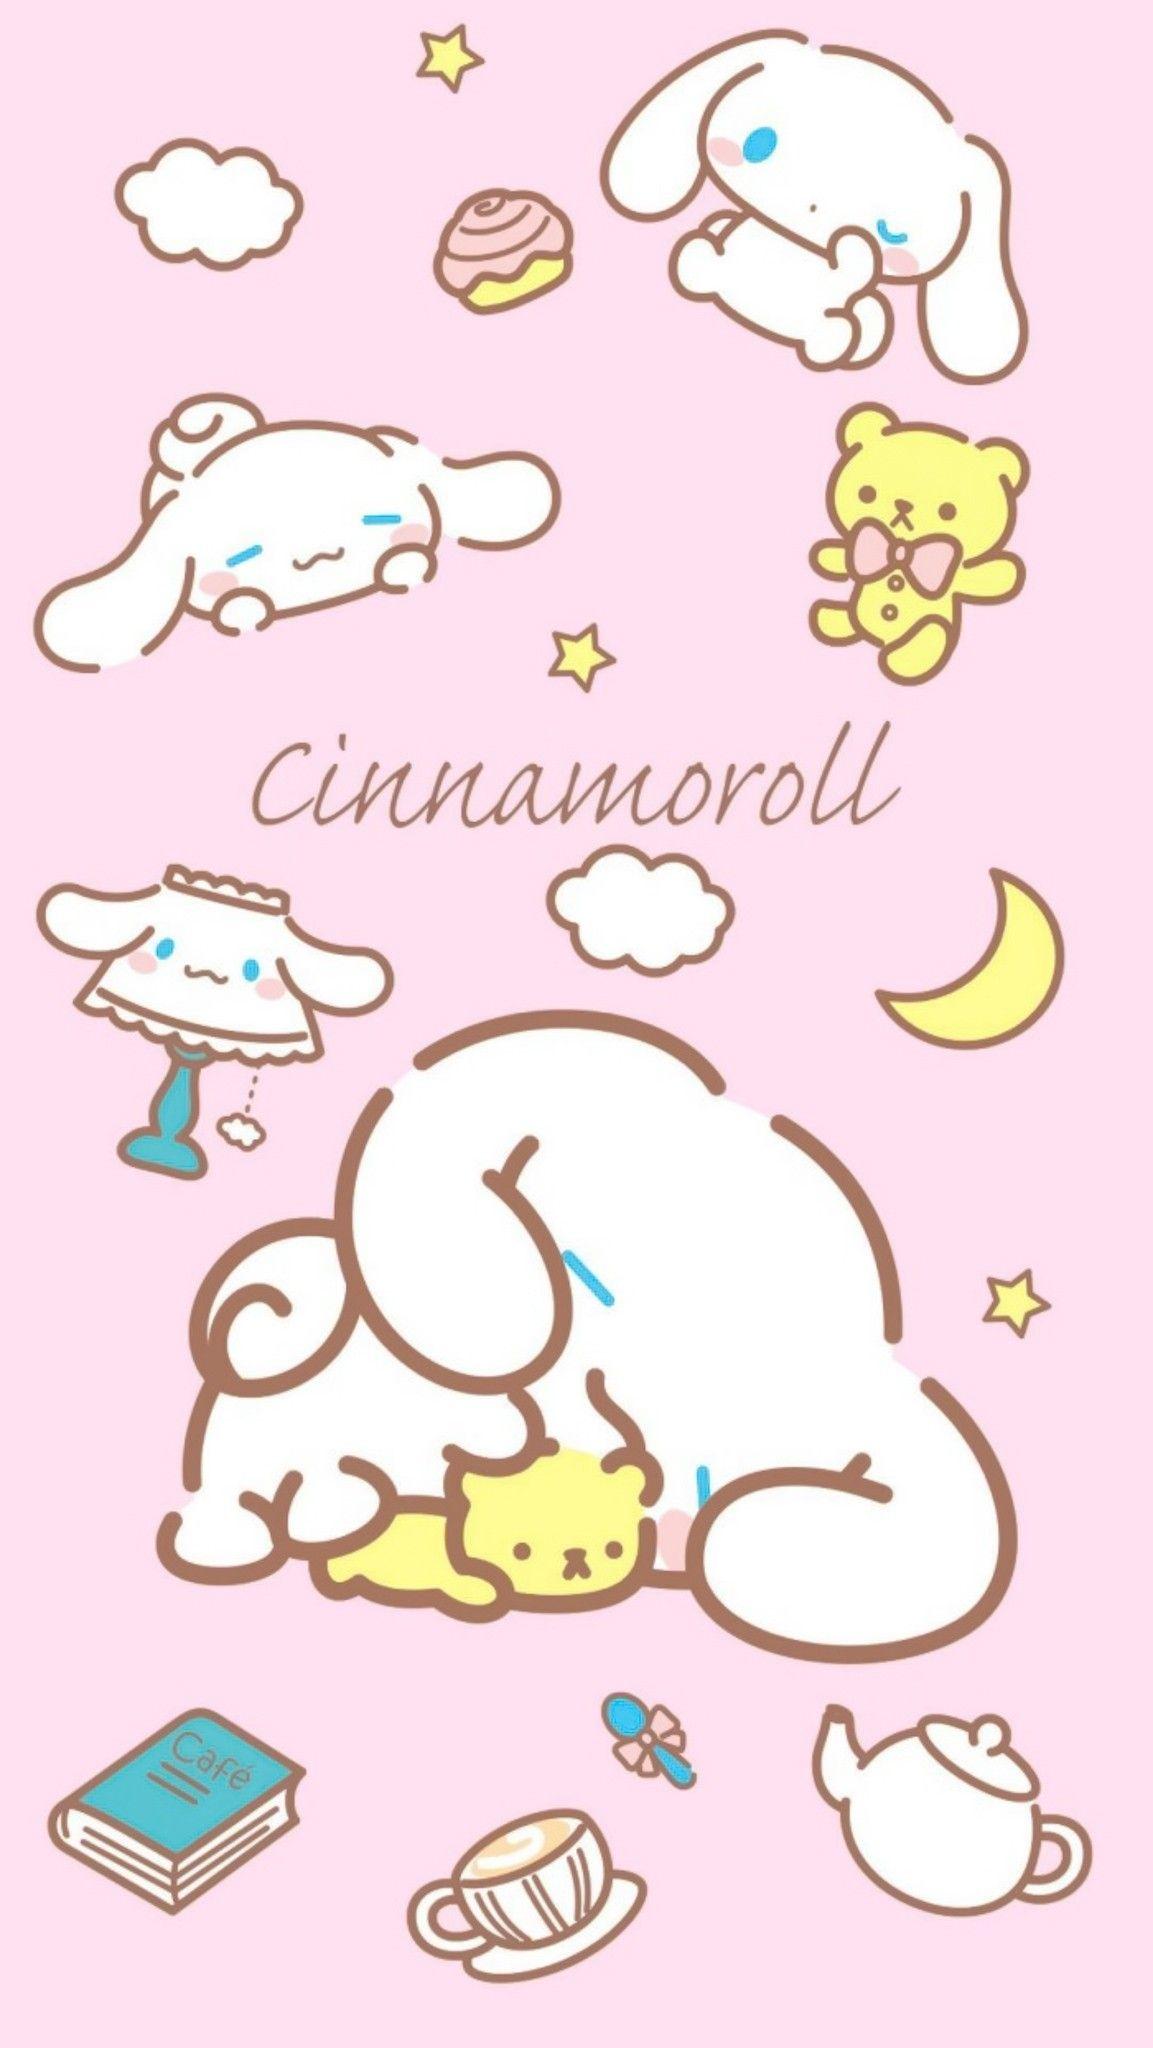 Pin By Fairy Belle On Kawaii In 2020 Sanrio Wallpaper Cute Wallpapers Animal Crossing Characters